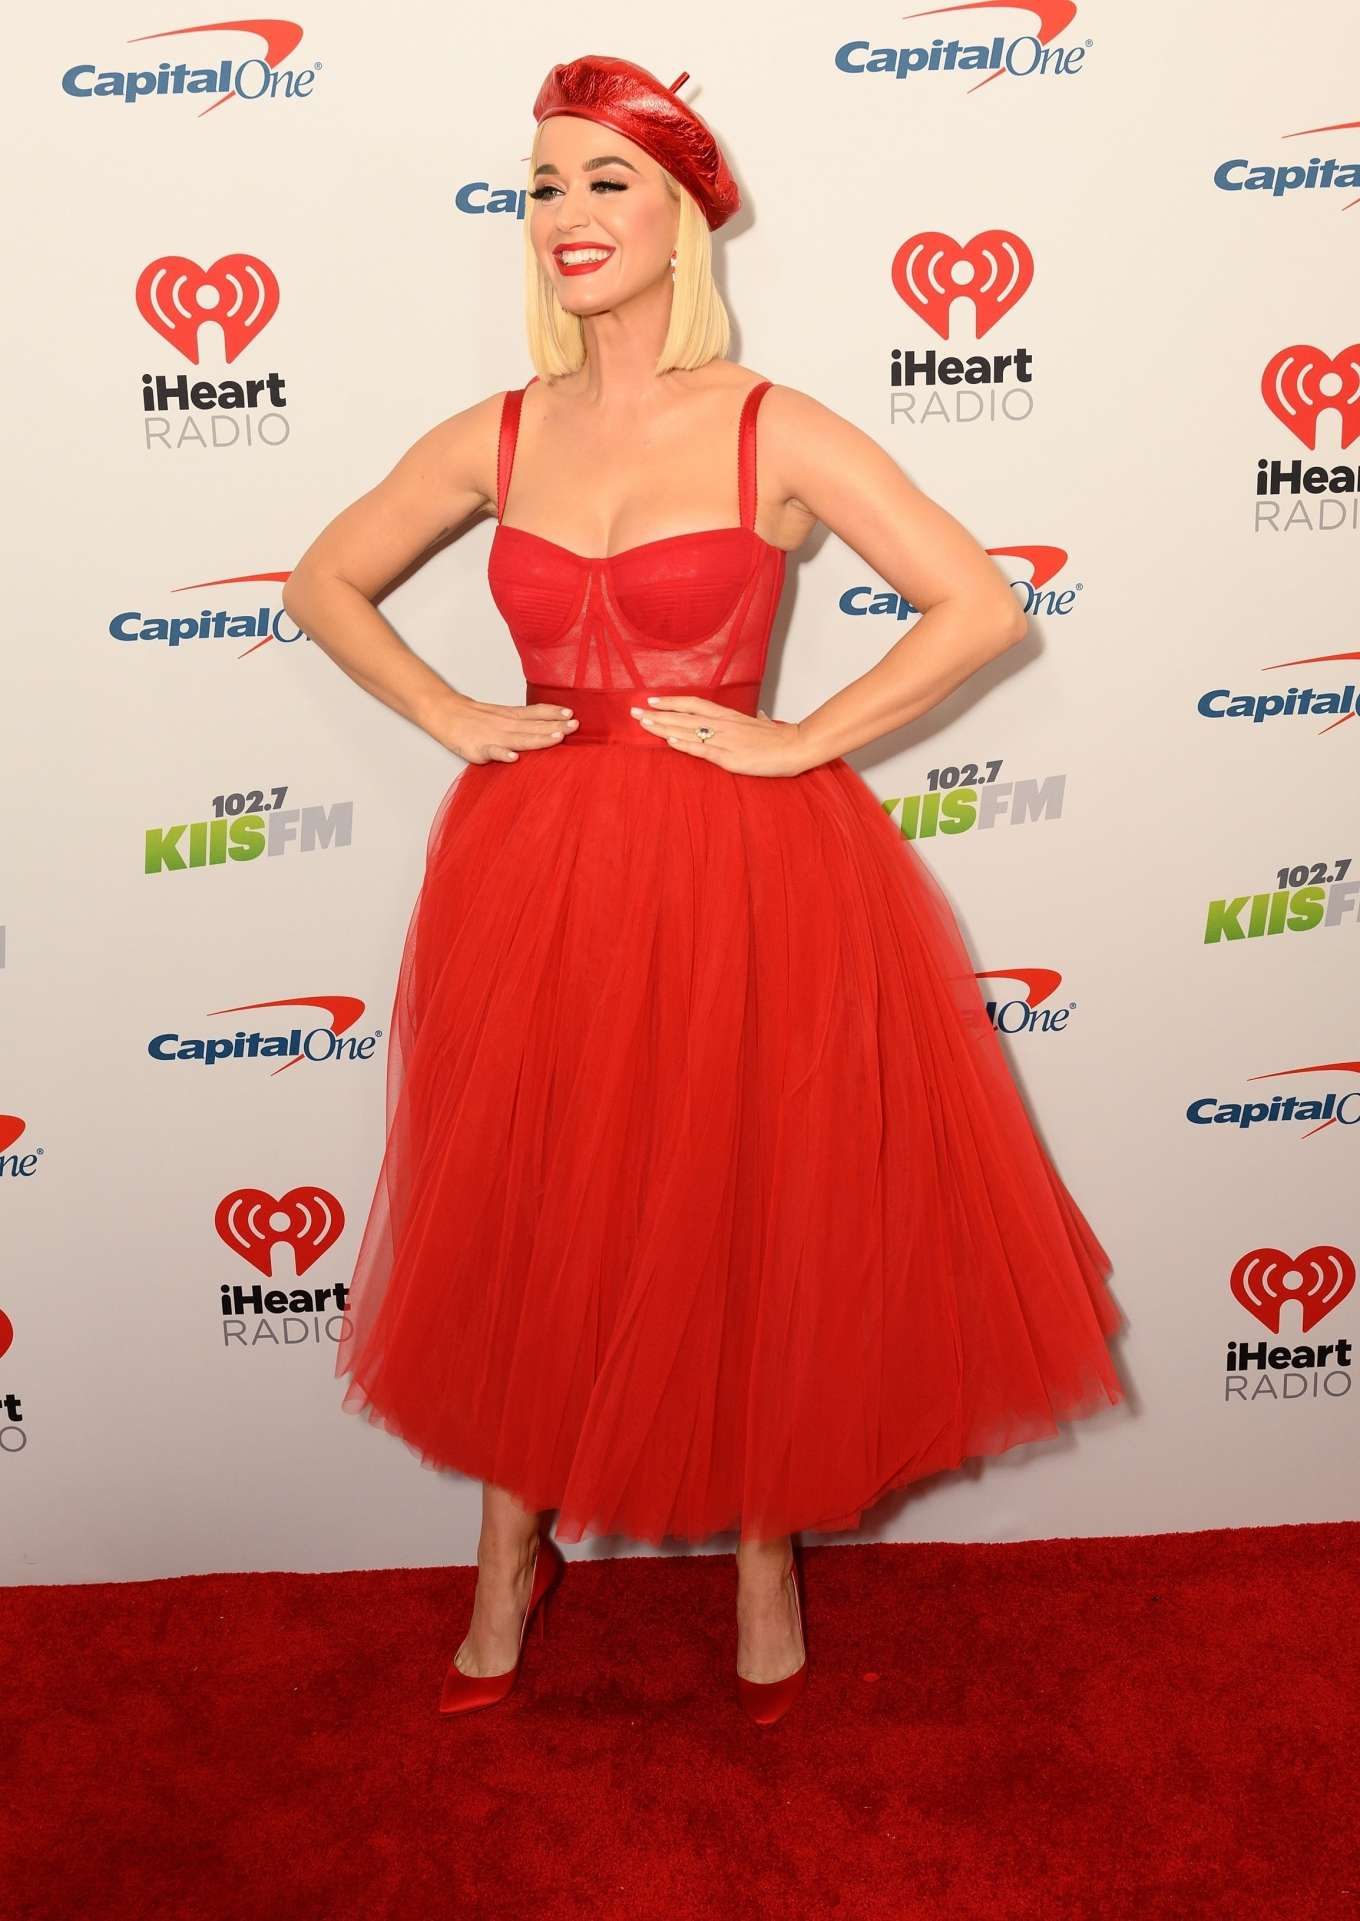 Katy Perry 2019 : Katy Perry – 2019 KIIS FMs iHeartRadio Jingle Ball-04